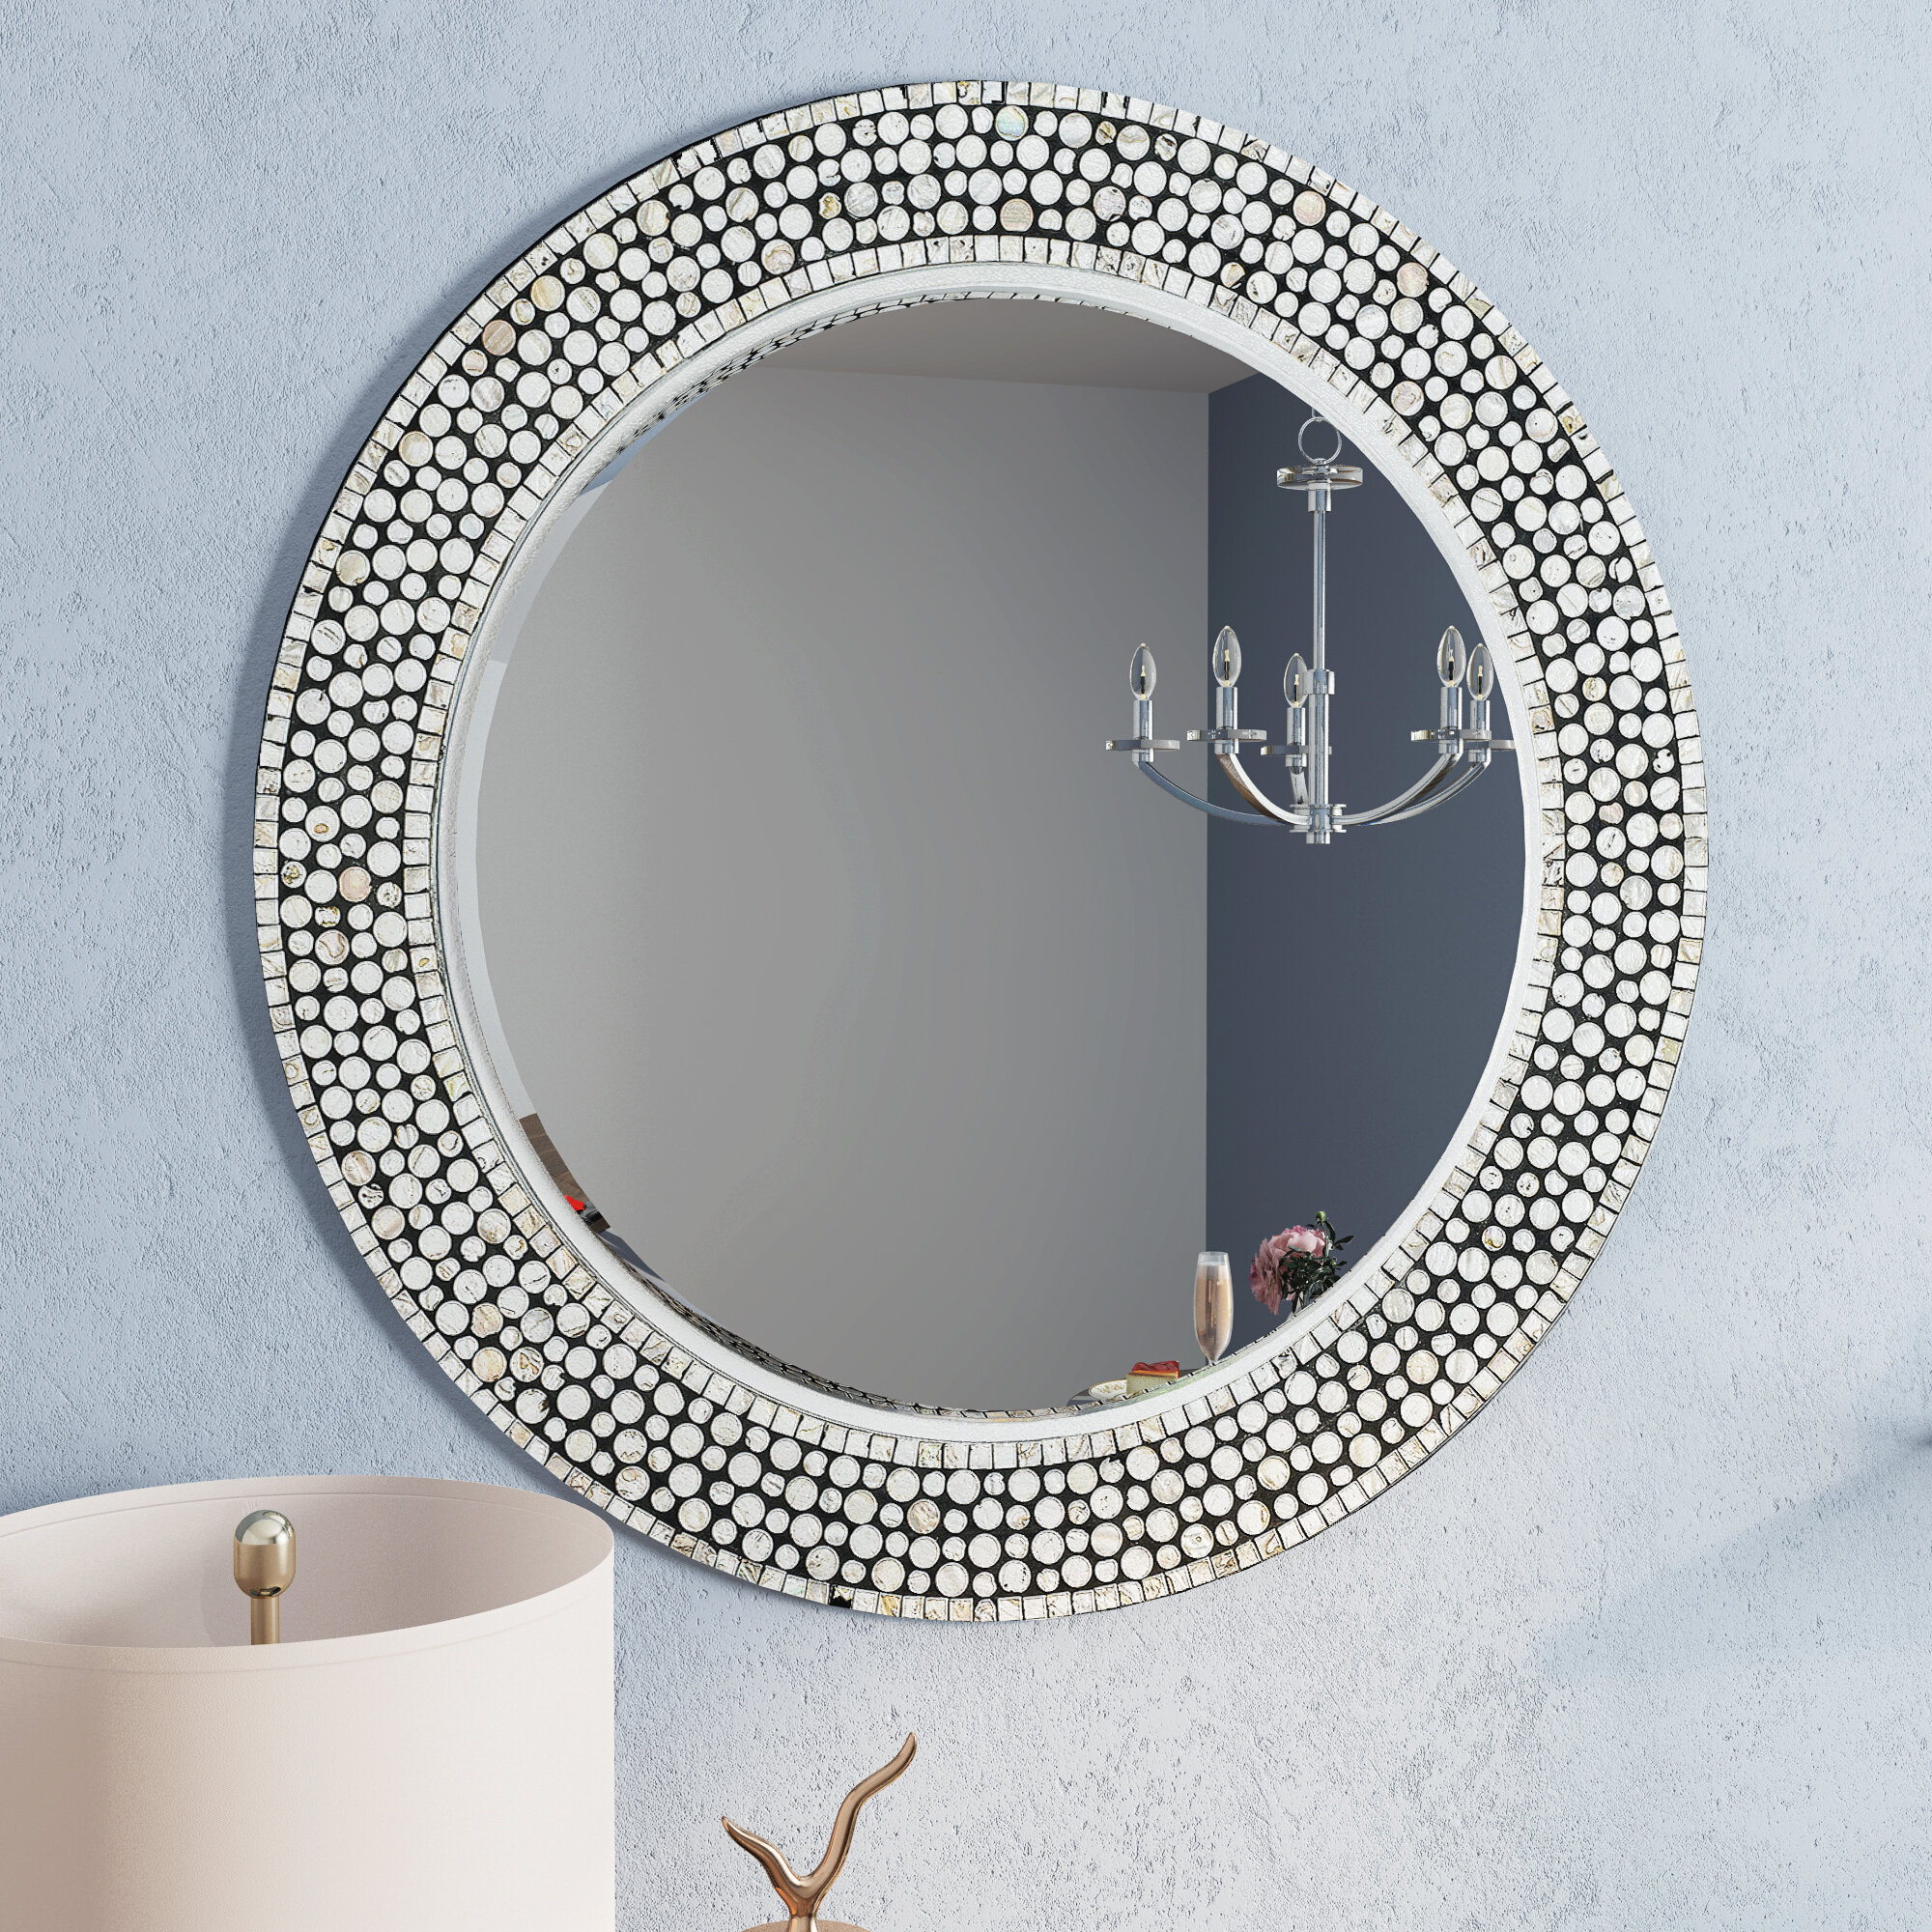 Willa Arlo Interiors Dhruv Round Gray Decorative Wall Mirror Reviews Wayfair